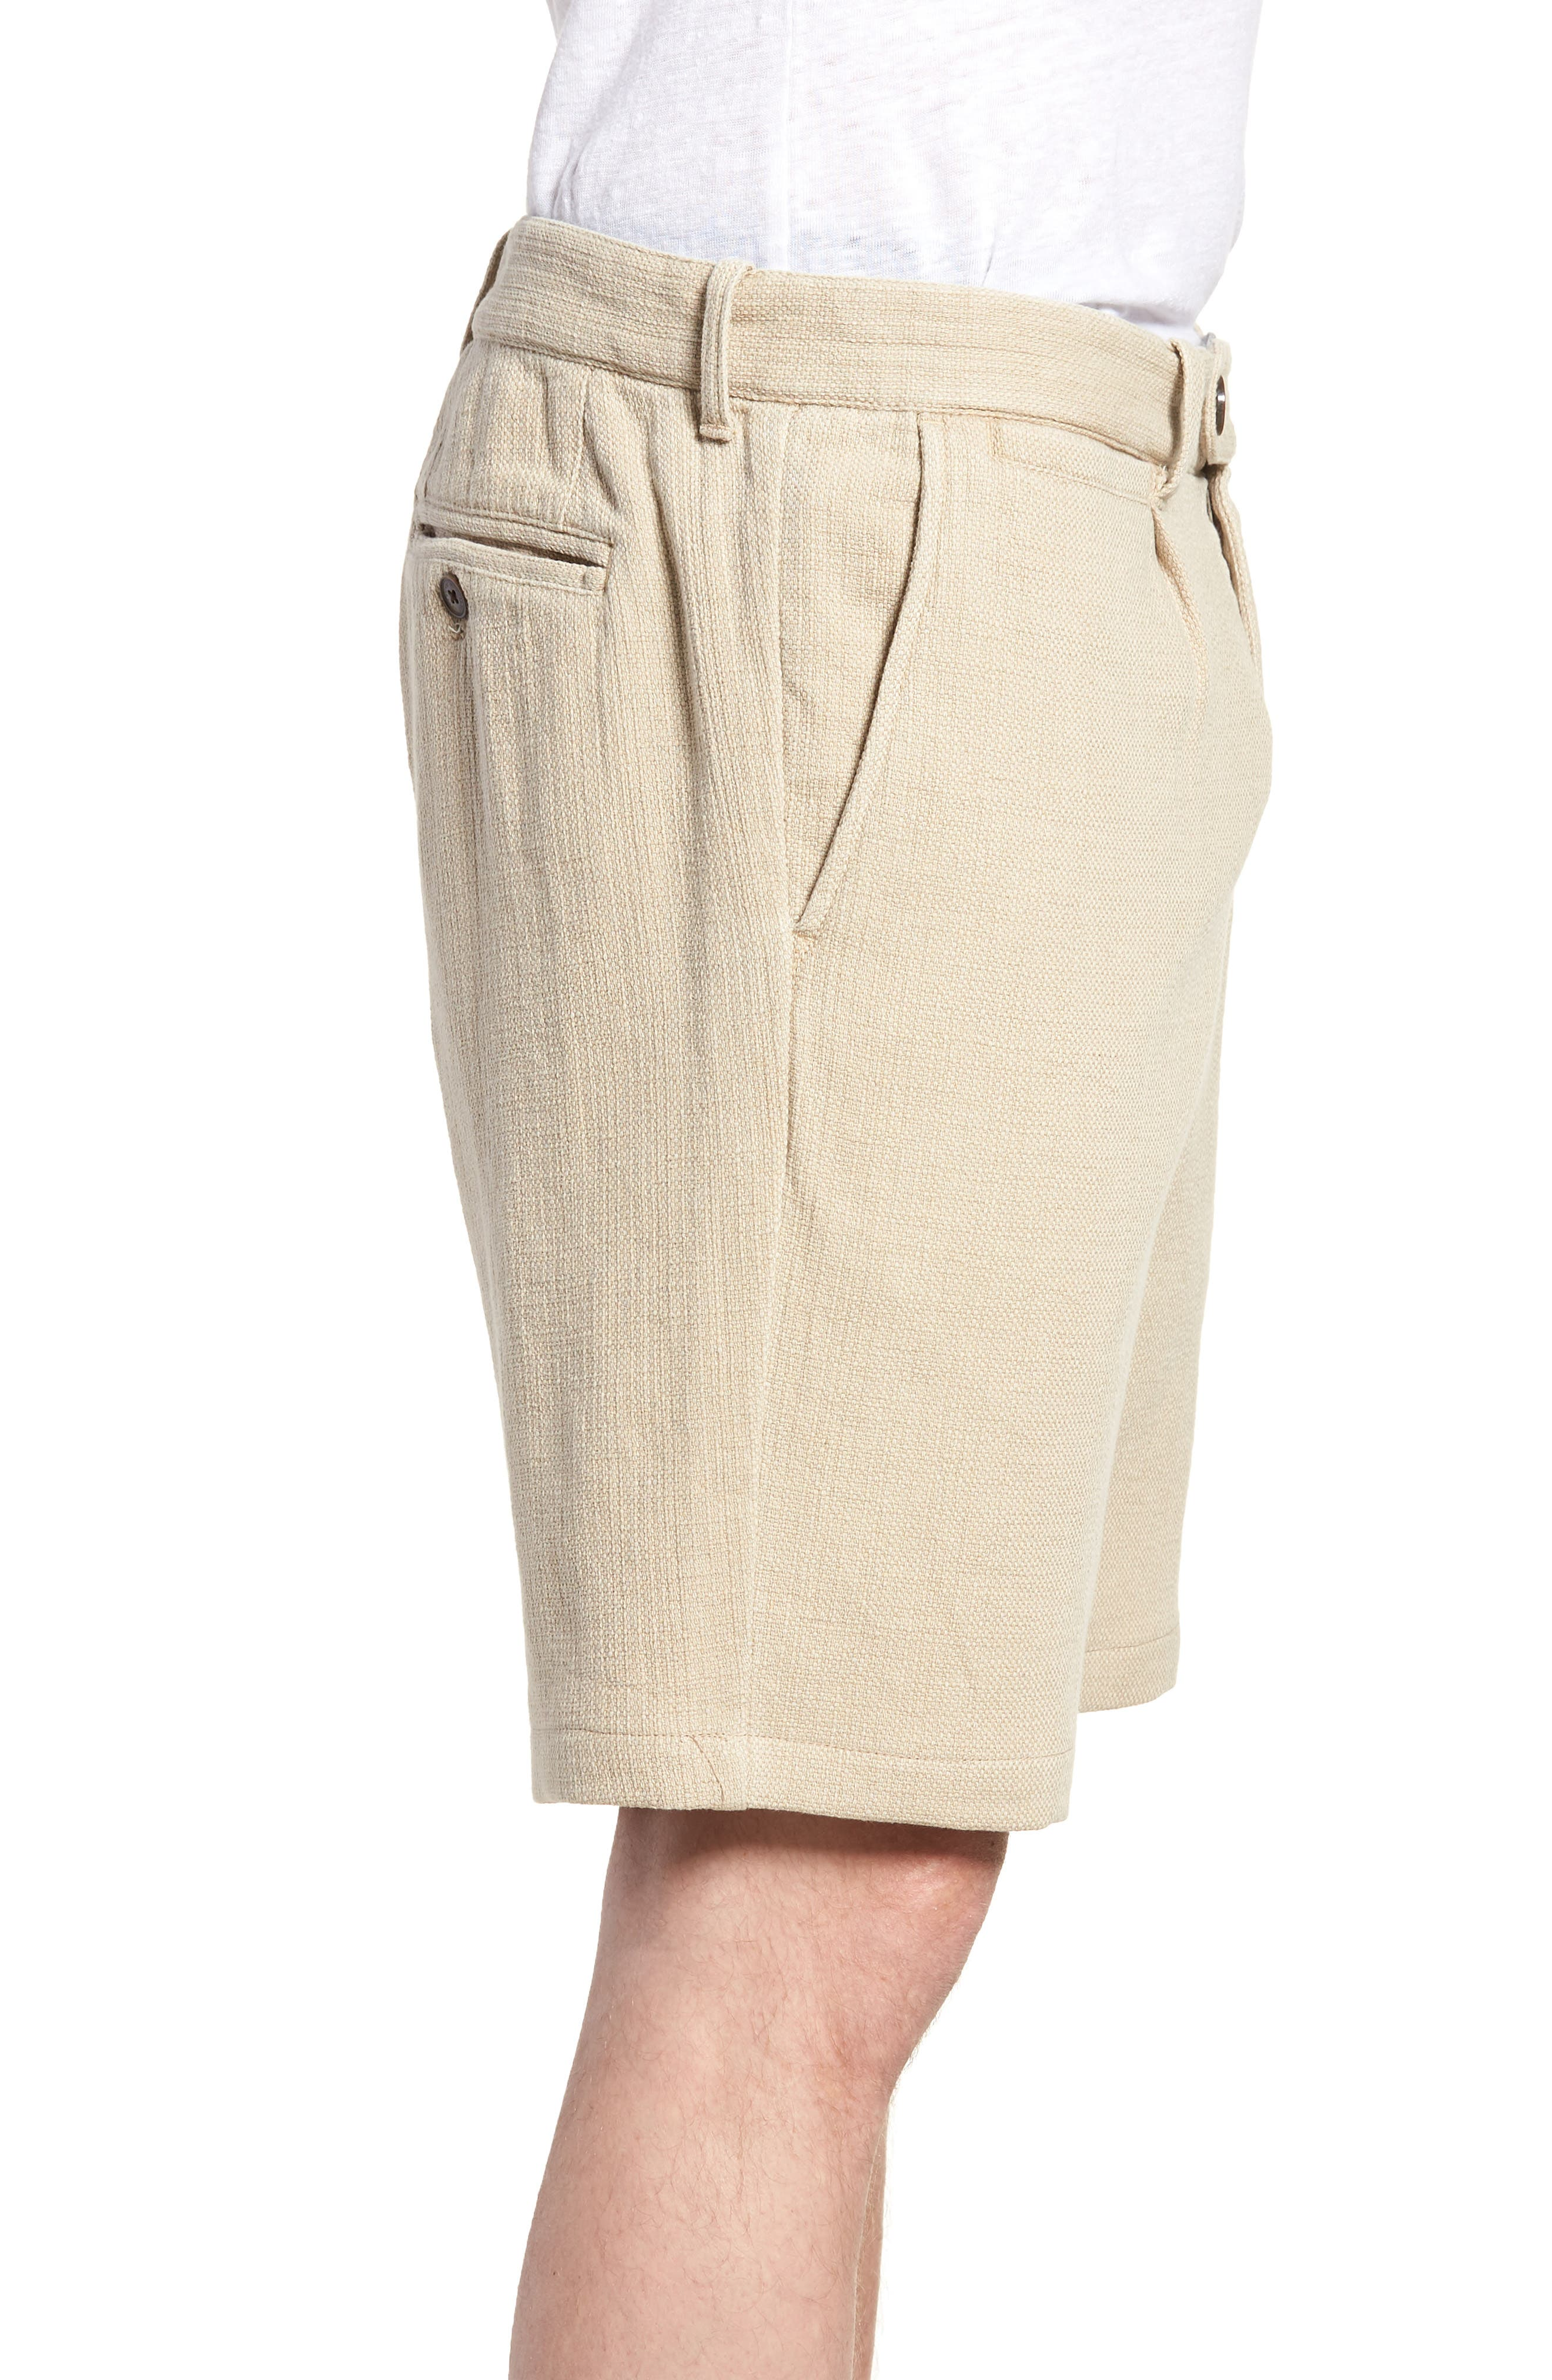 NIFTY GENIUS,                             Thomas Regular Fit Pleated Shorts,                             Alternate thumbnail 3, color,                             250